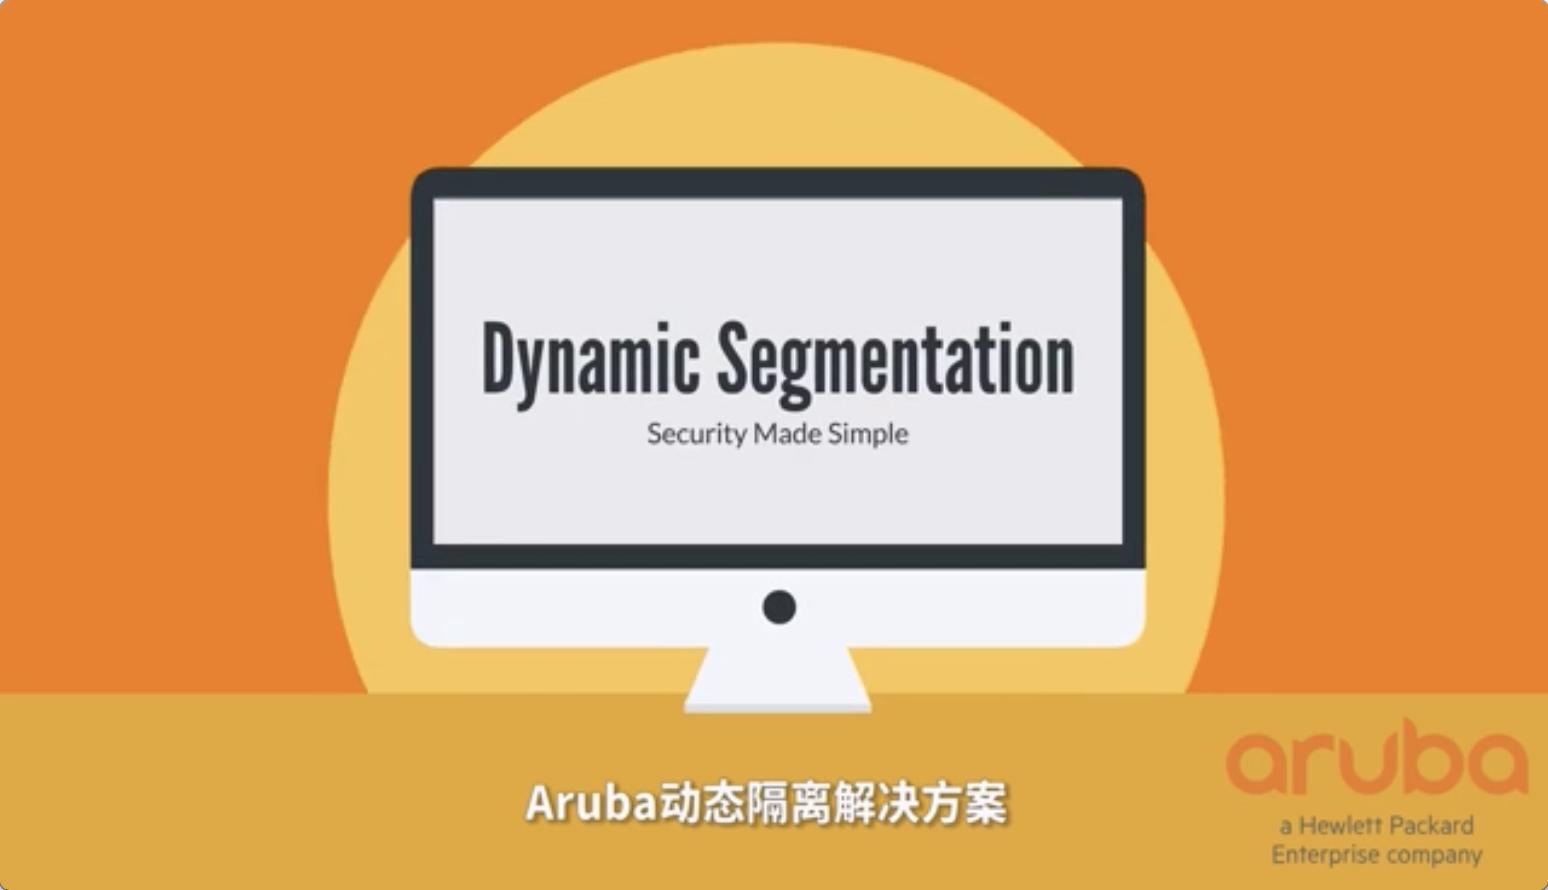 Aruba Dynamic Segmentation